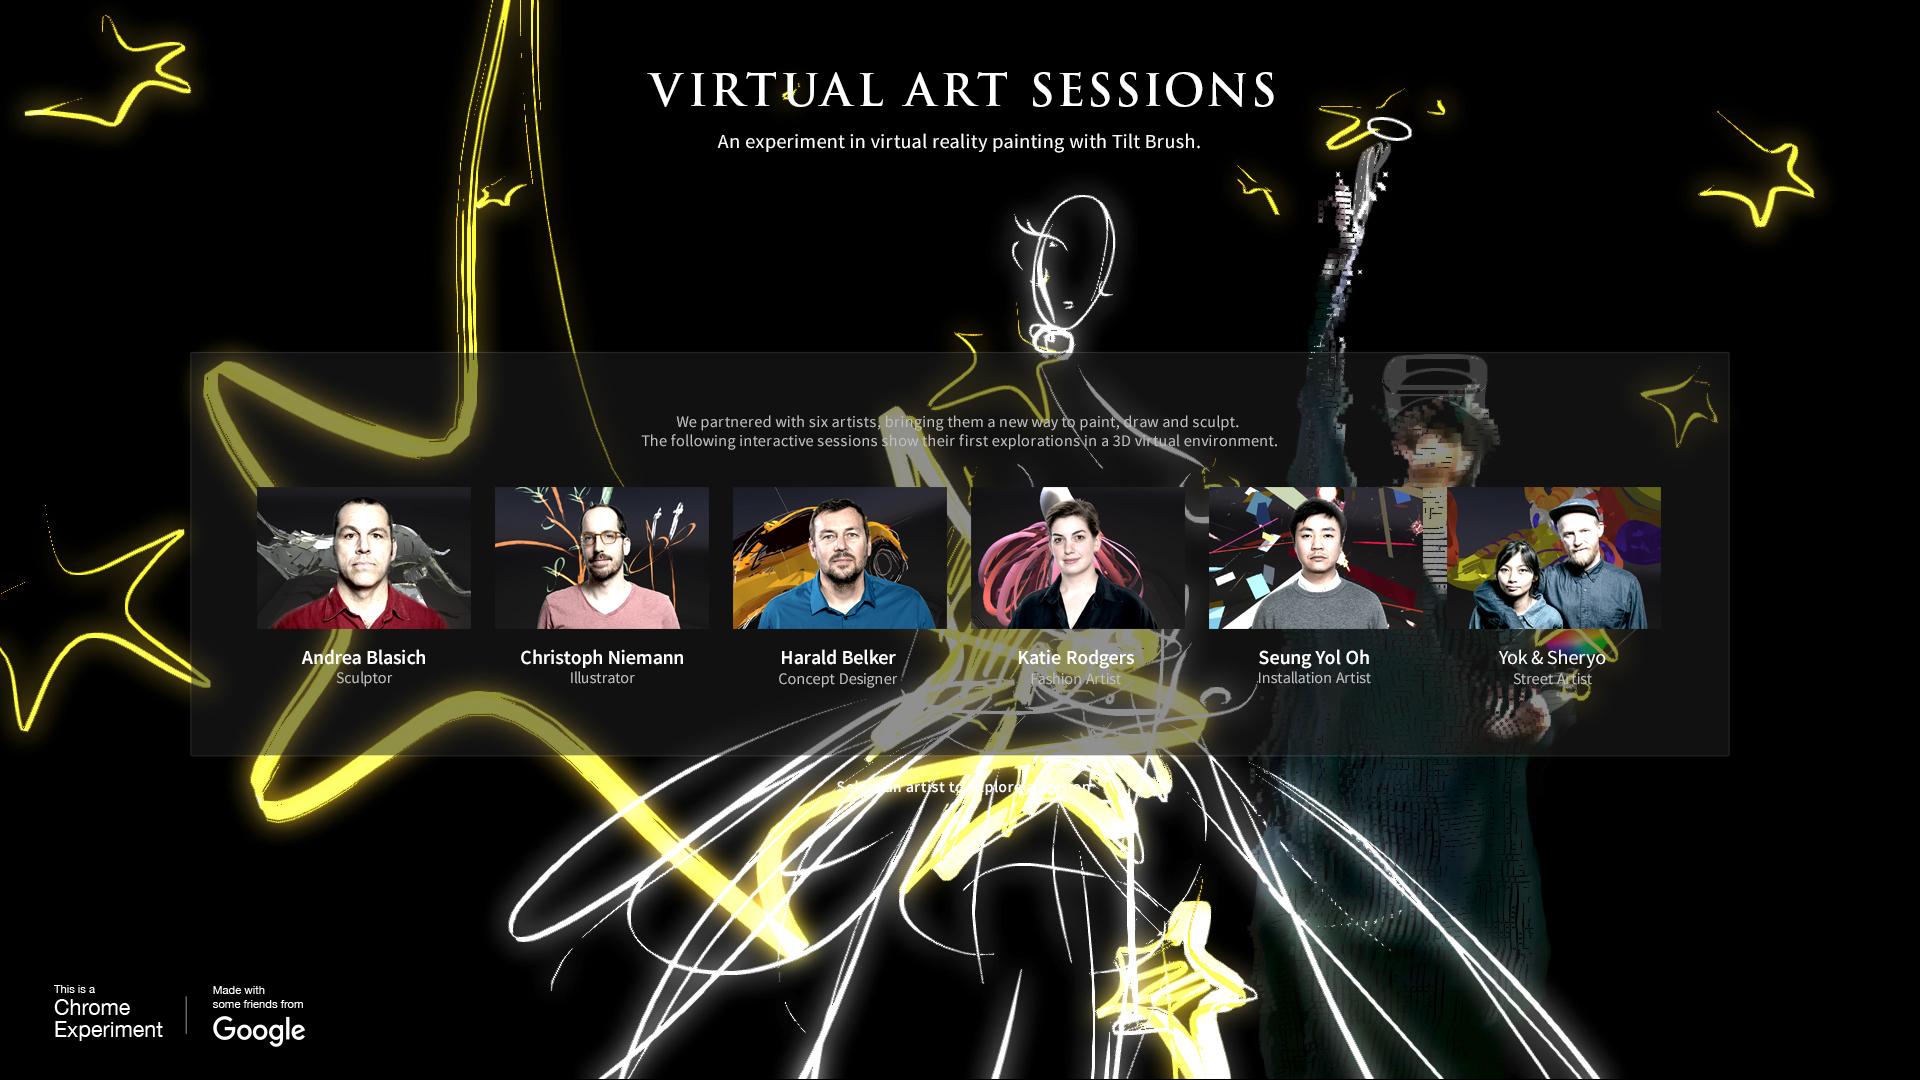 VirtualArtSessions_1920x1080_2.jpg